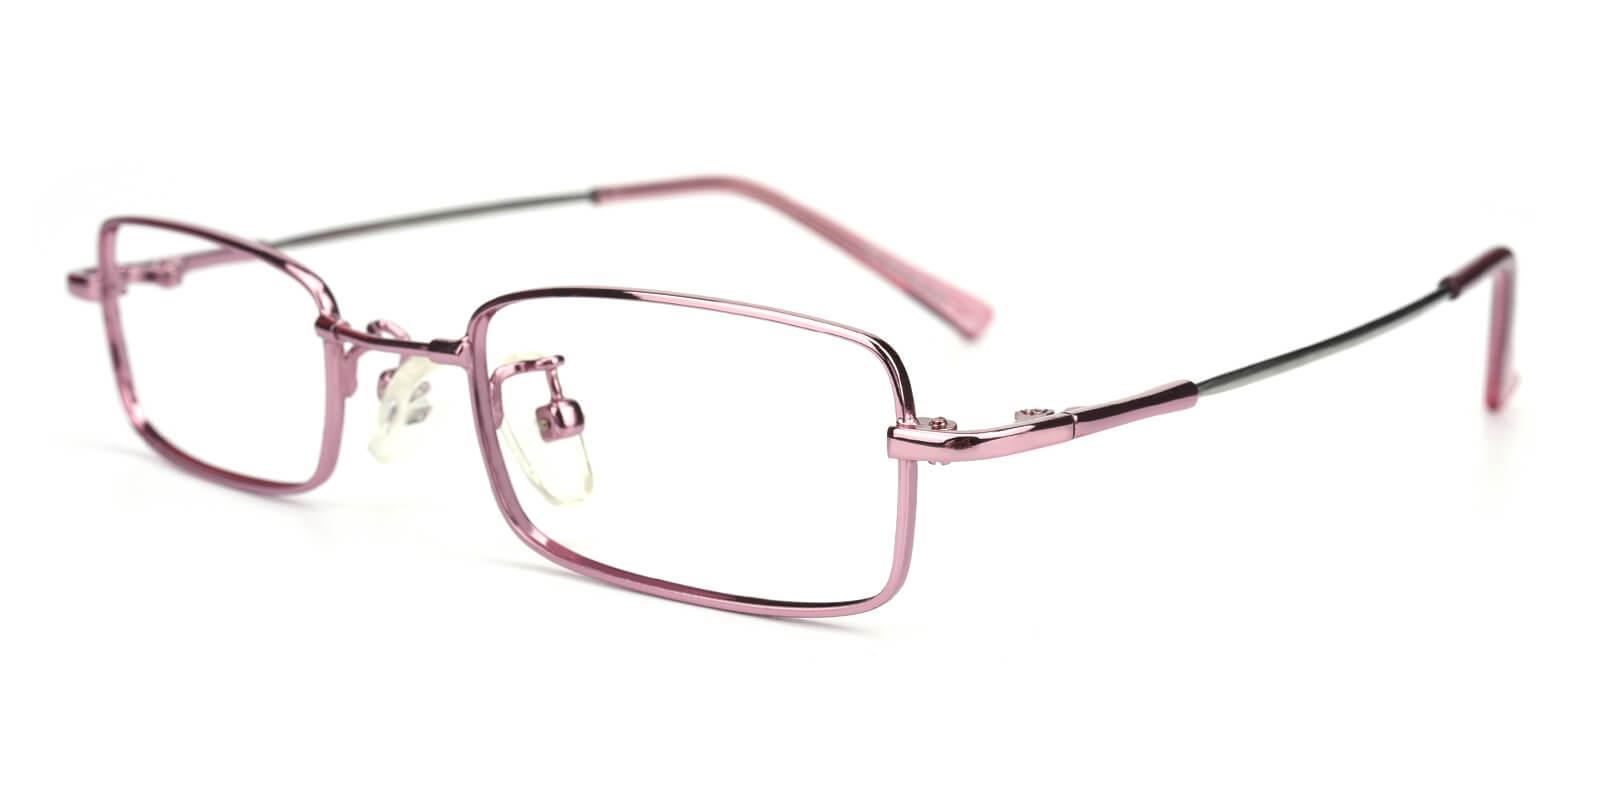 Lanscripe-Purple-Rectangle-Titanium-Eyeglasses-additional1